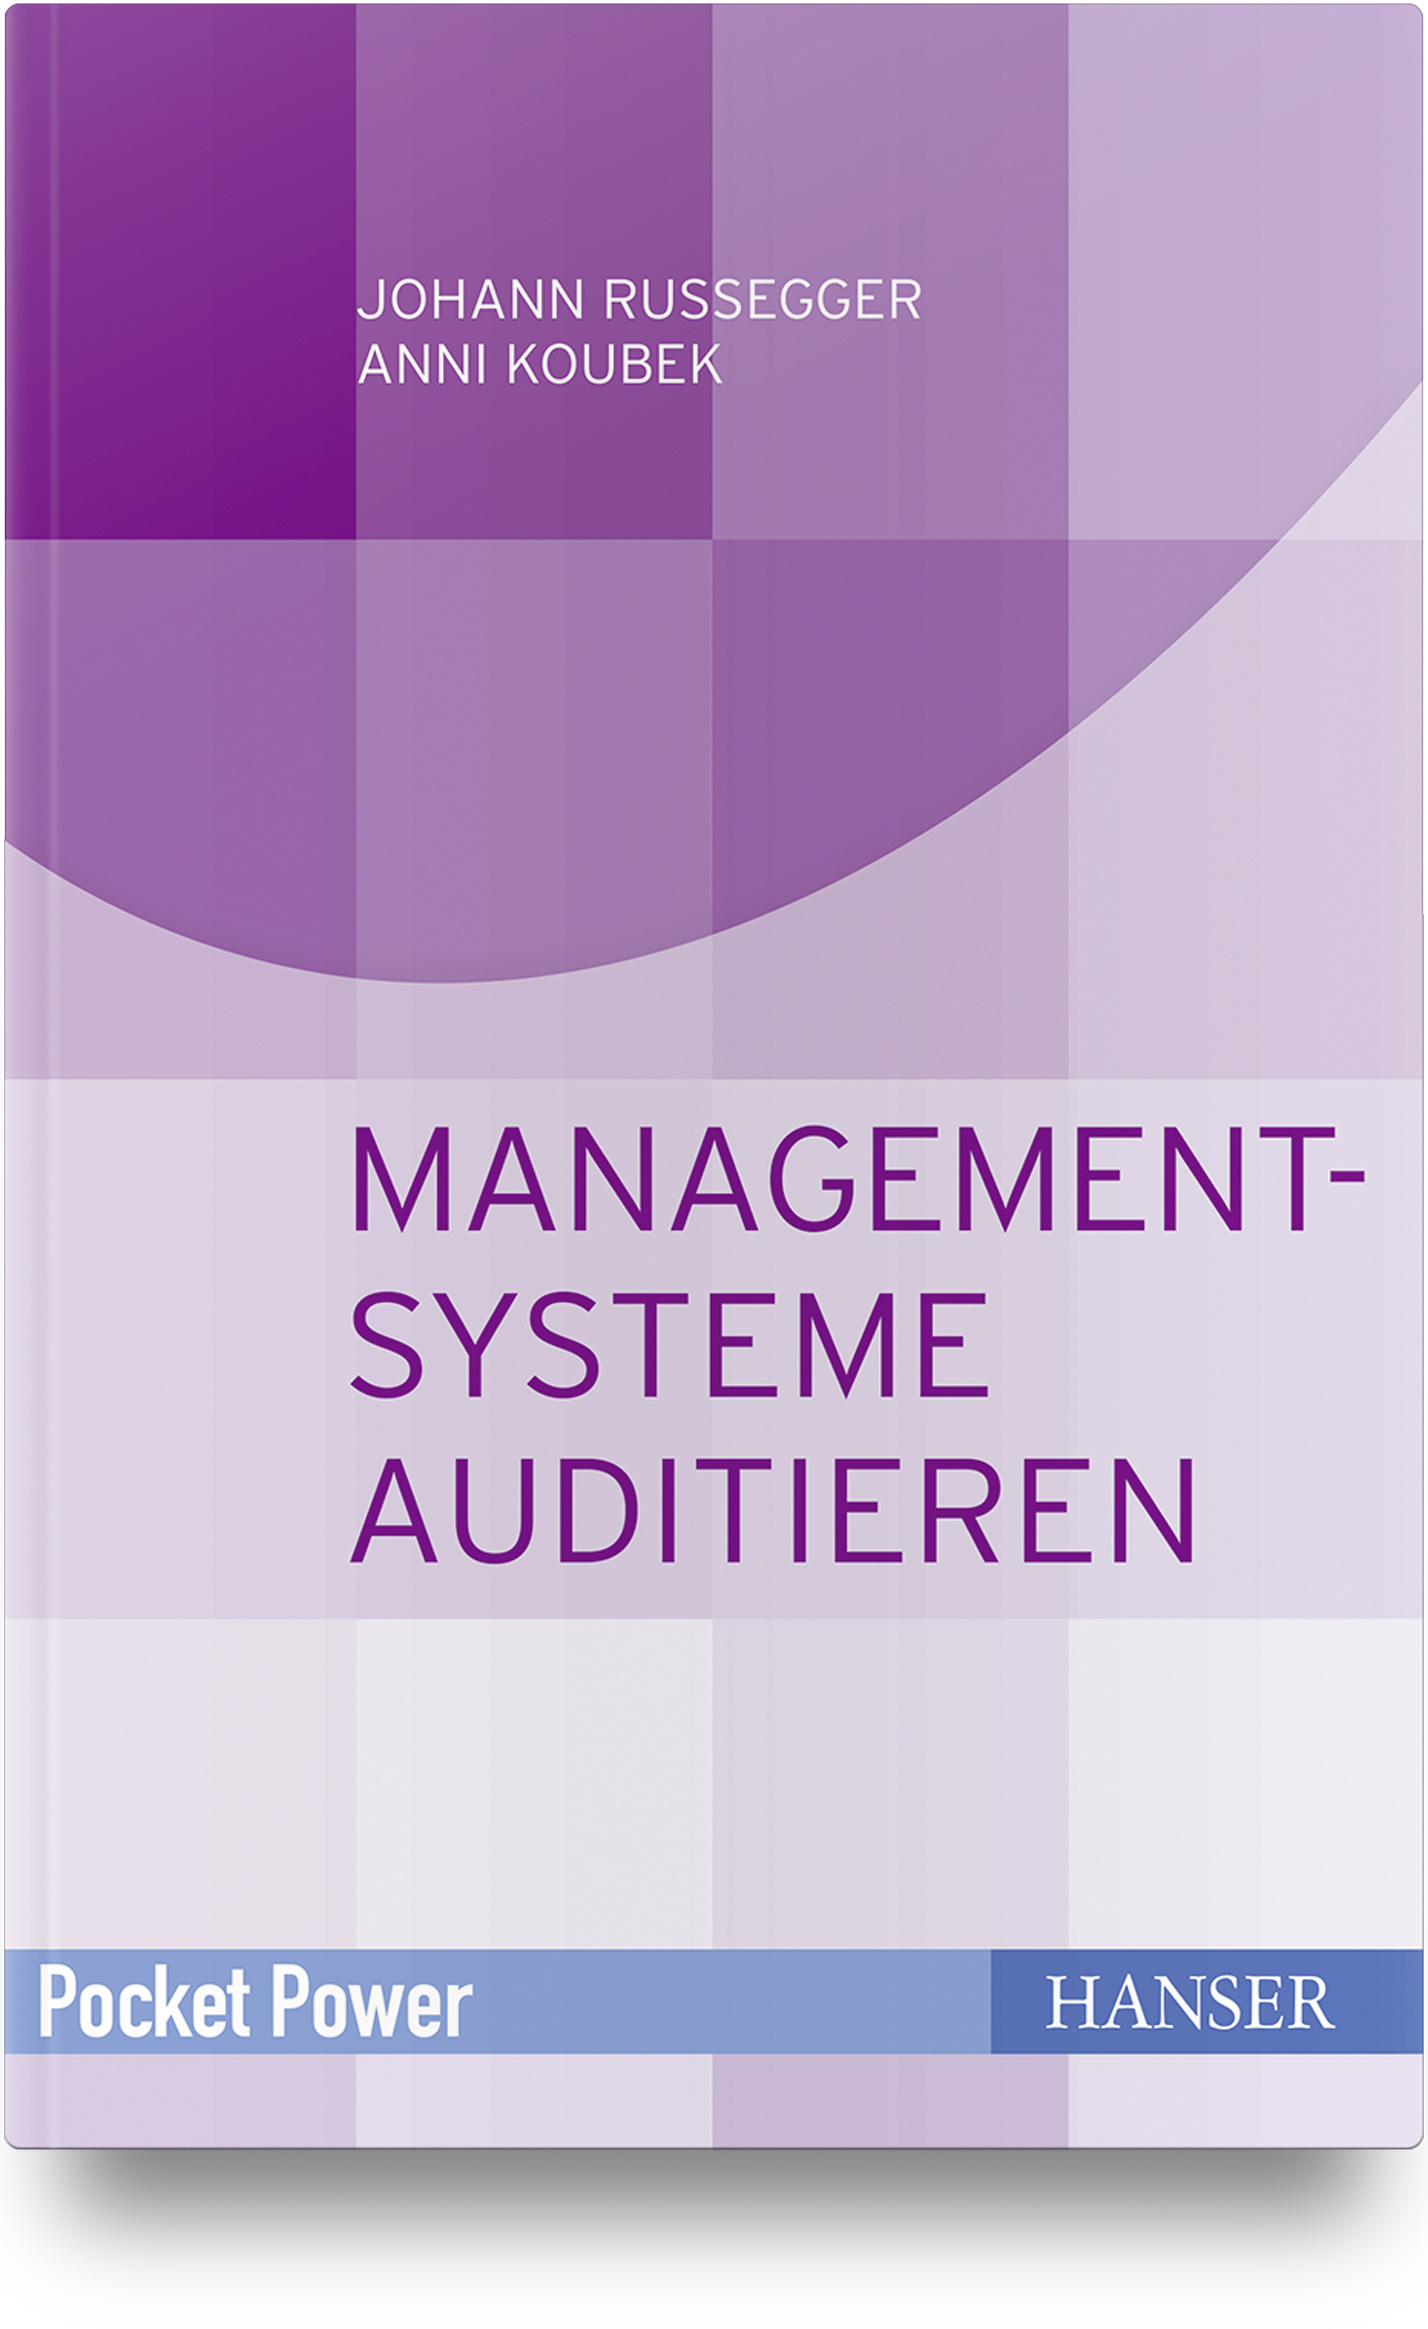 Rußegger, Koubek, Managementsysteme auditieren, 978-3-446-45834-5